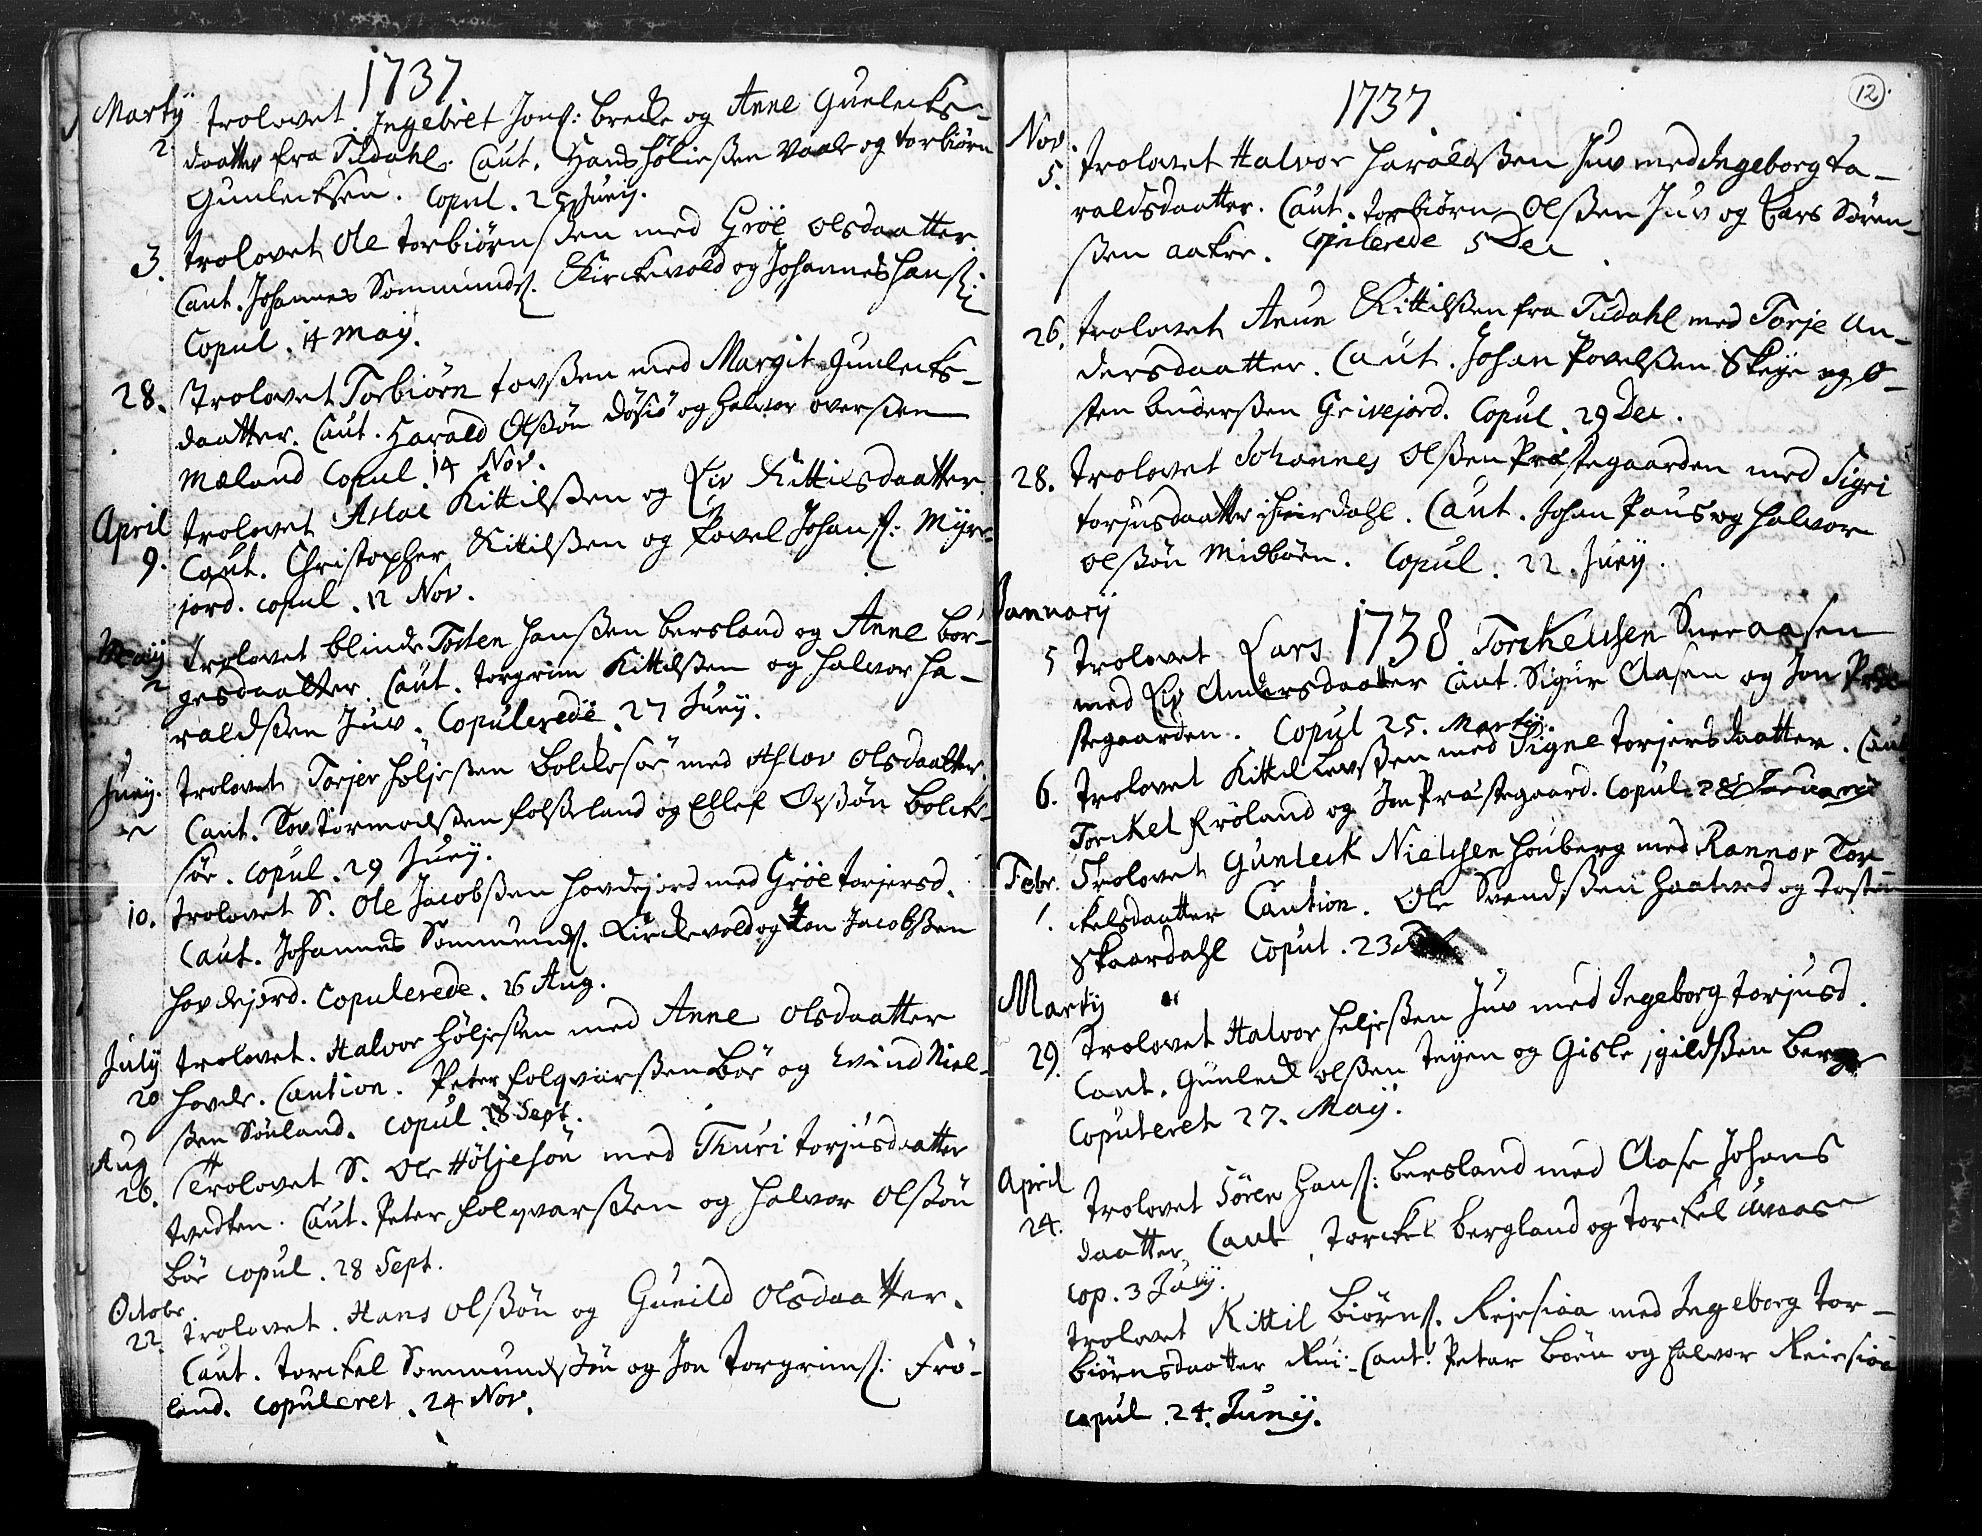 SAKO, Hjartdal kirkebøker, F/Fa/L0004: Ministerialbok nr. I 4, 1727-1795, s. 12